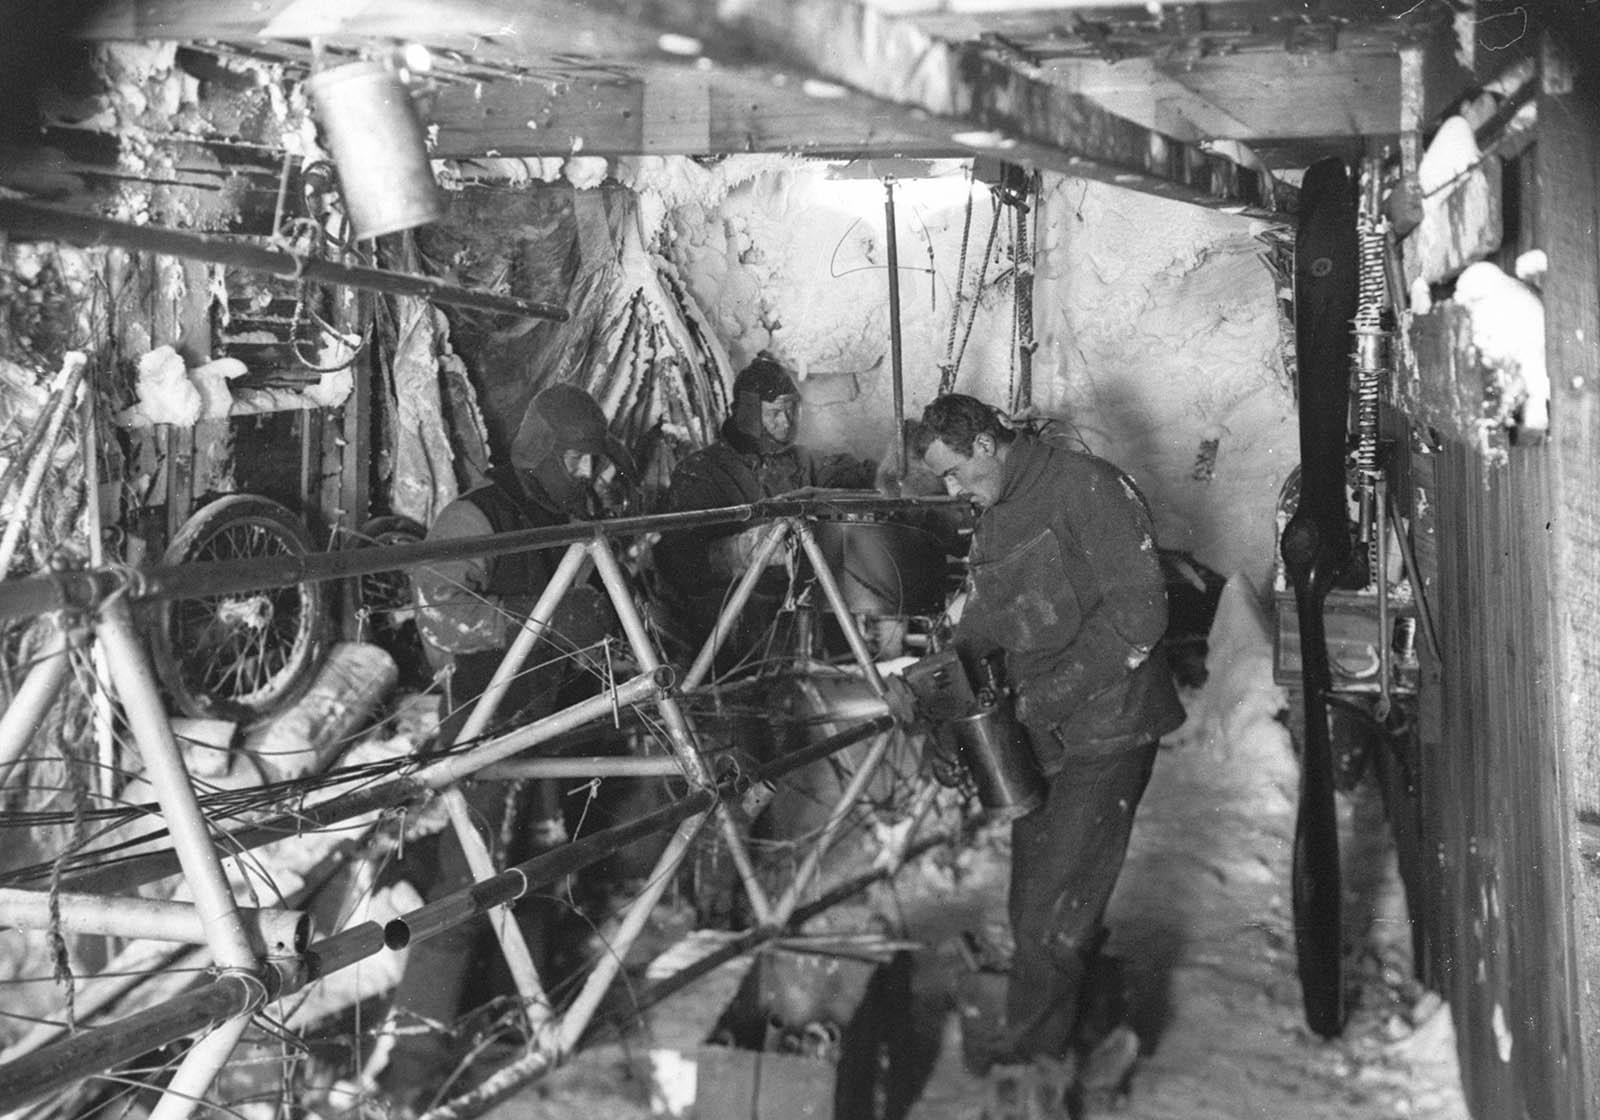 Mawson, Mawson's Huts, Mawson's Huts Foundation, Cape Denison, East Antarctica, Antarctica, Australasian Antarctic Expedition, AAE, Australia's Antarctic Heritage, Antarctic History, Heroic Era of Antarctica, Mawson's Men